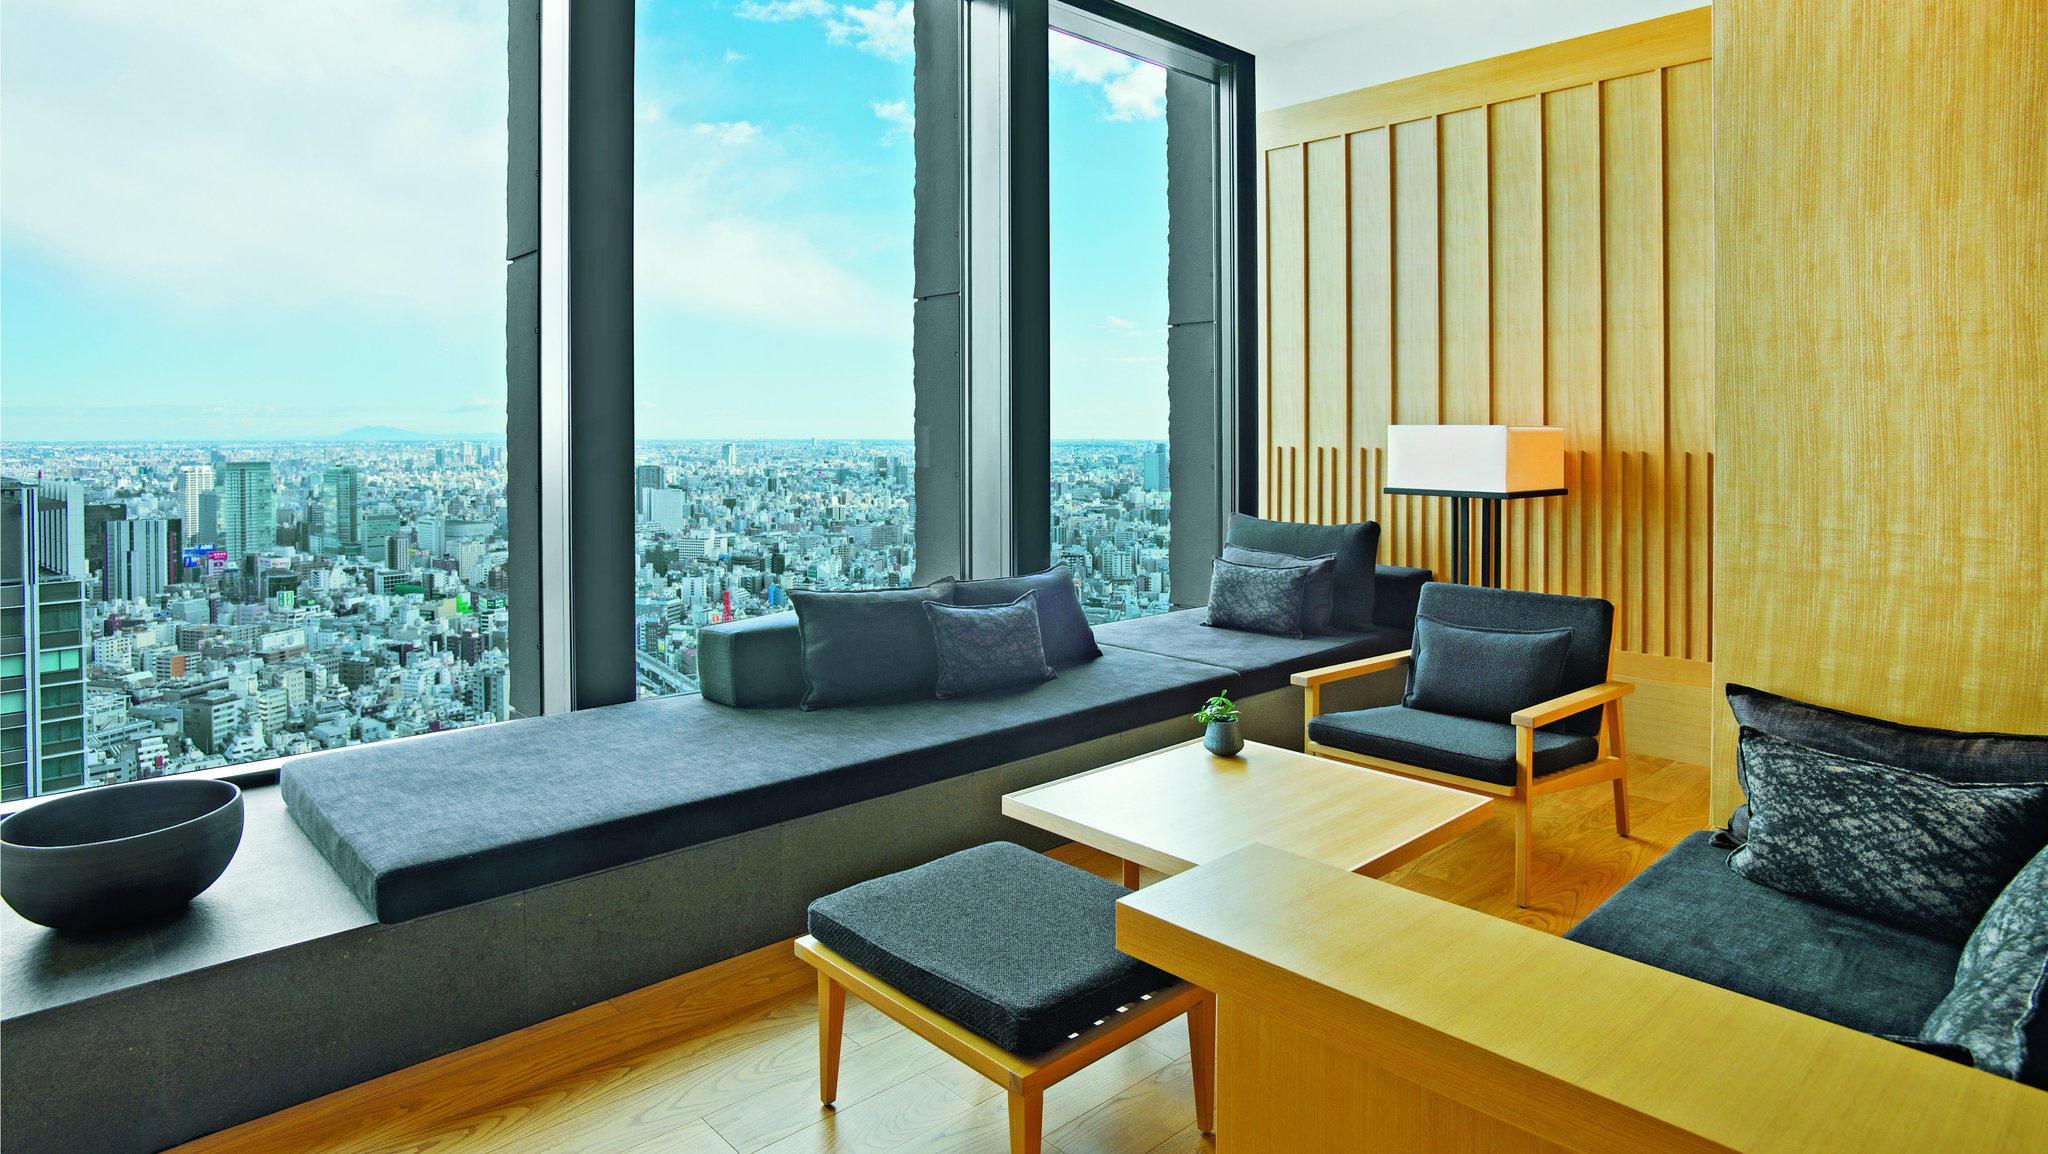 The Aman Tokyo